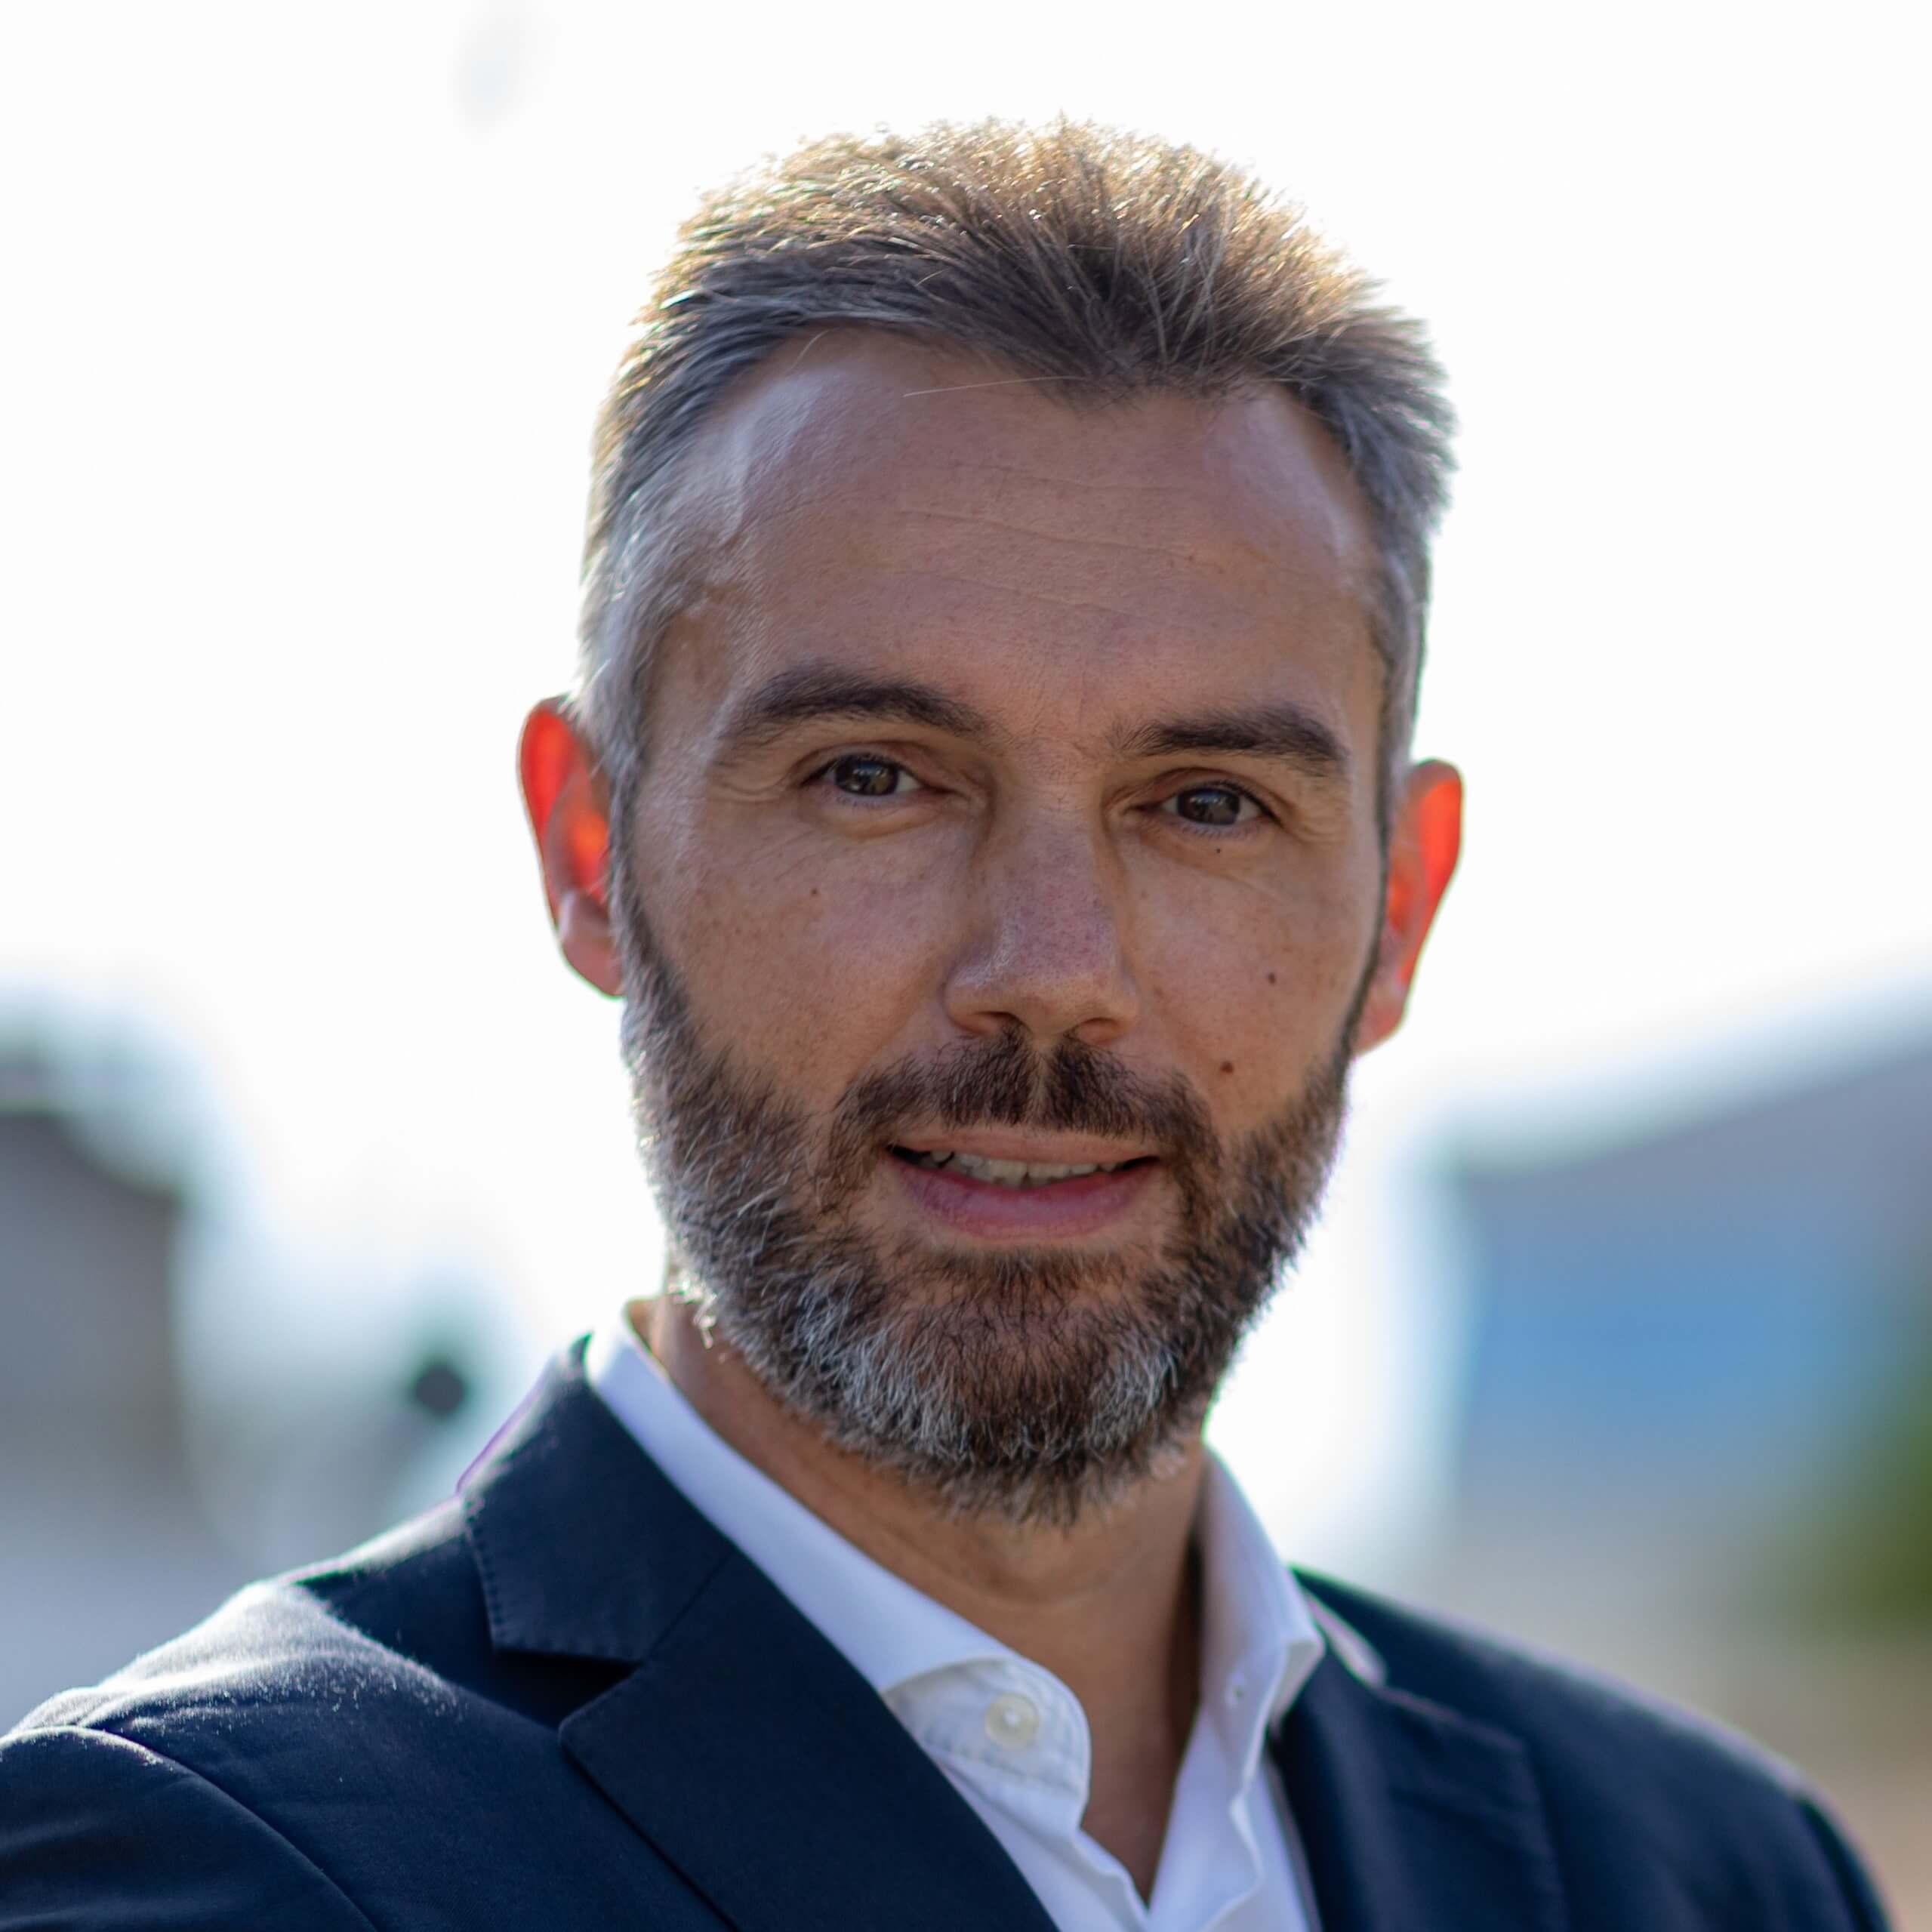 Ricardo Martins - Business Development Manager at Signify